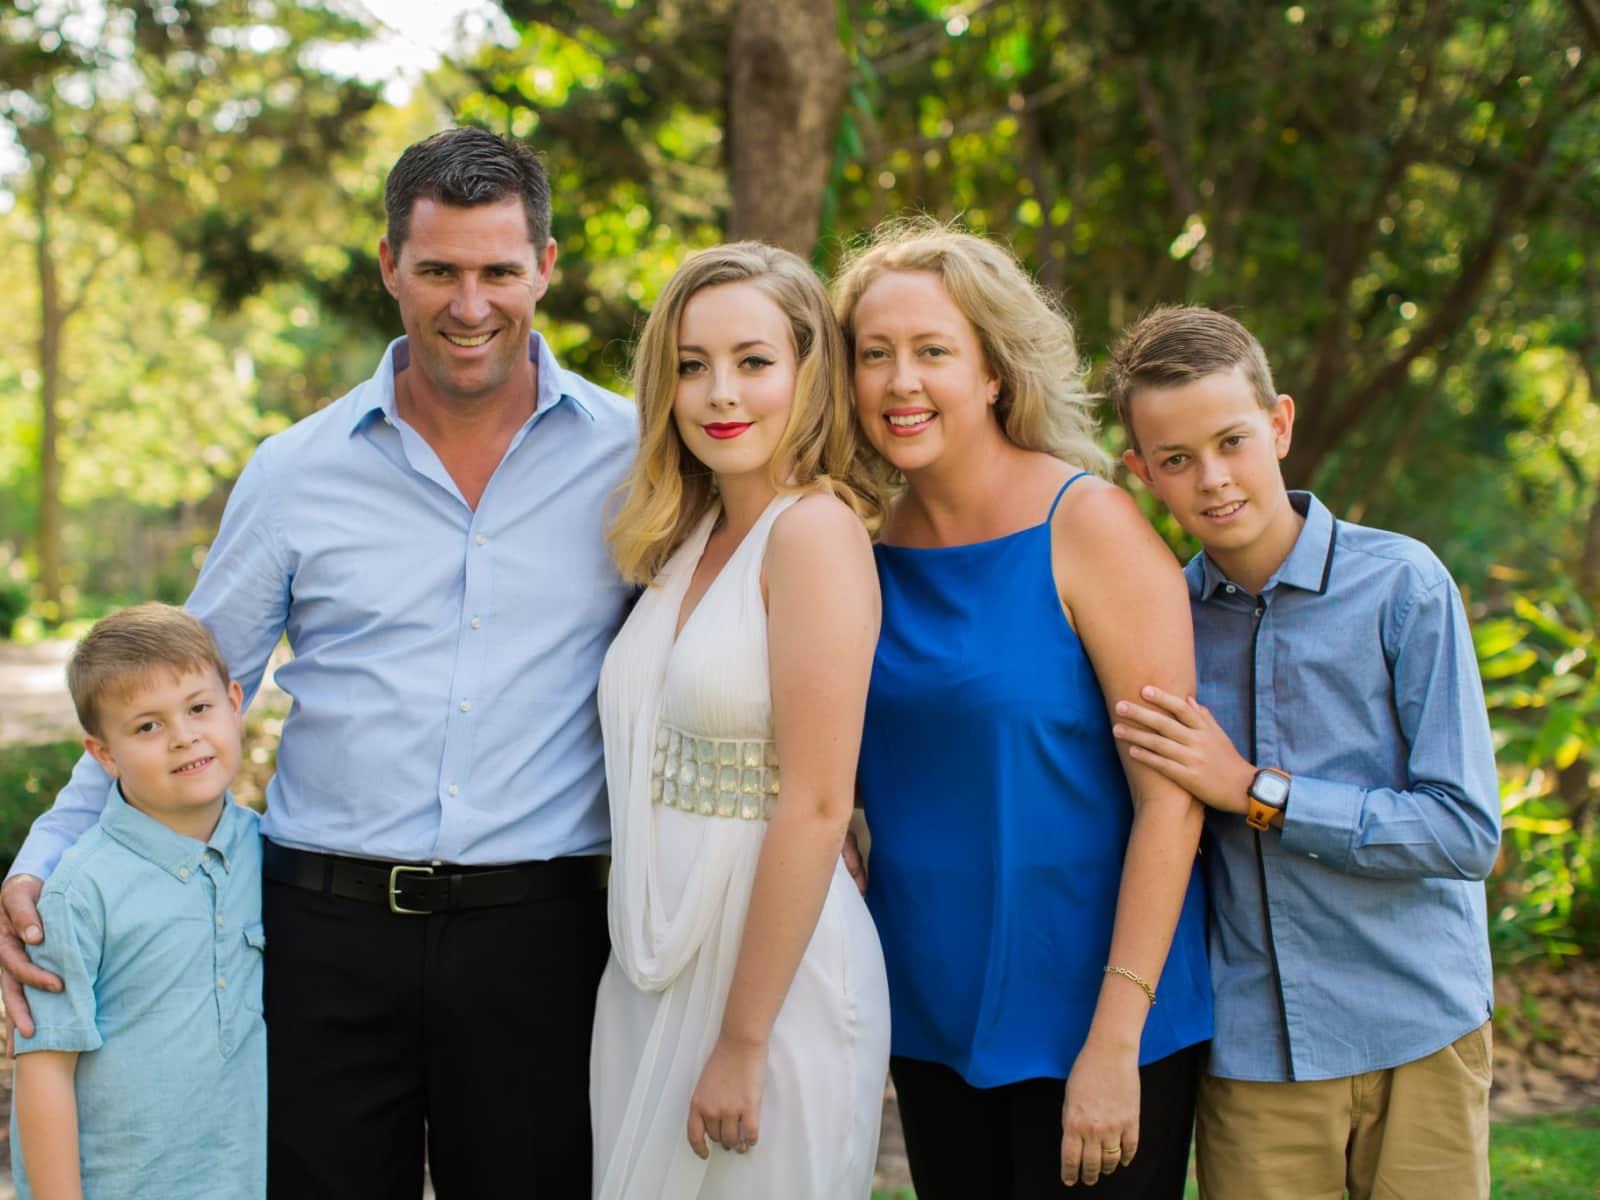 Melissa & Andrew from Hervey Bay, Queensland, Australia